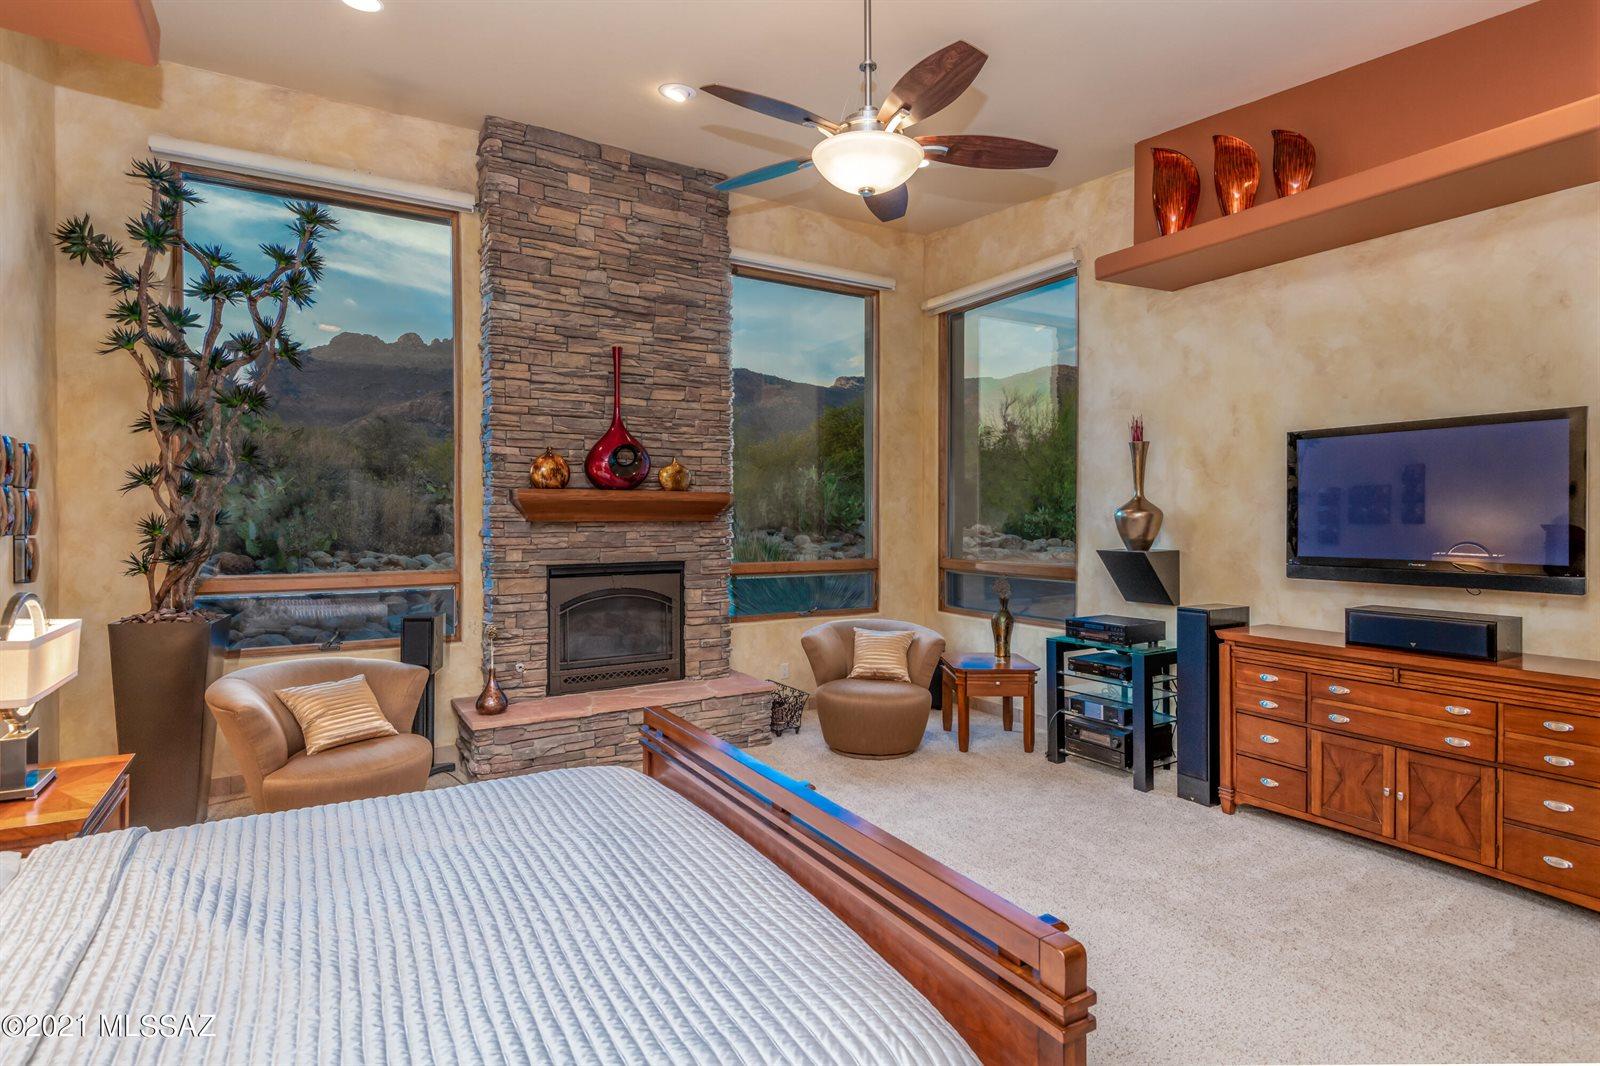 7586 North Mystic Canyon Drive, Tucson, AZ 85718